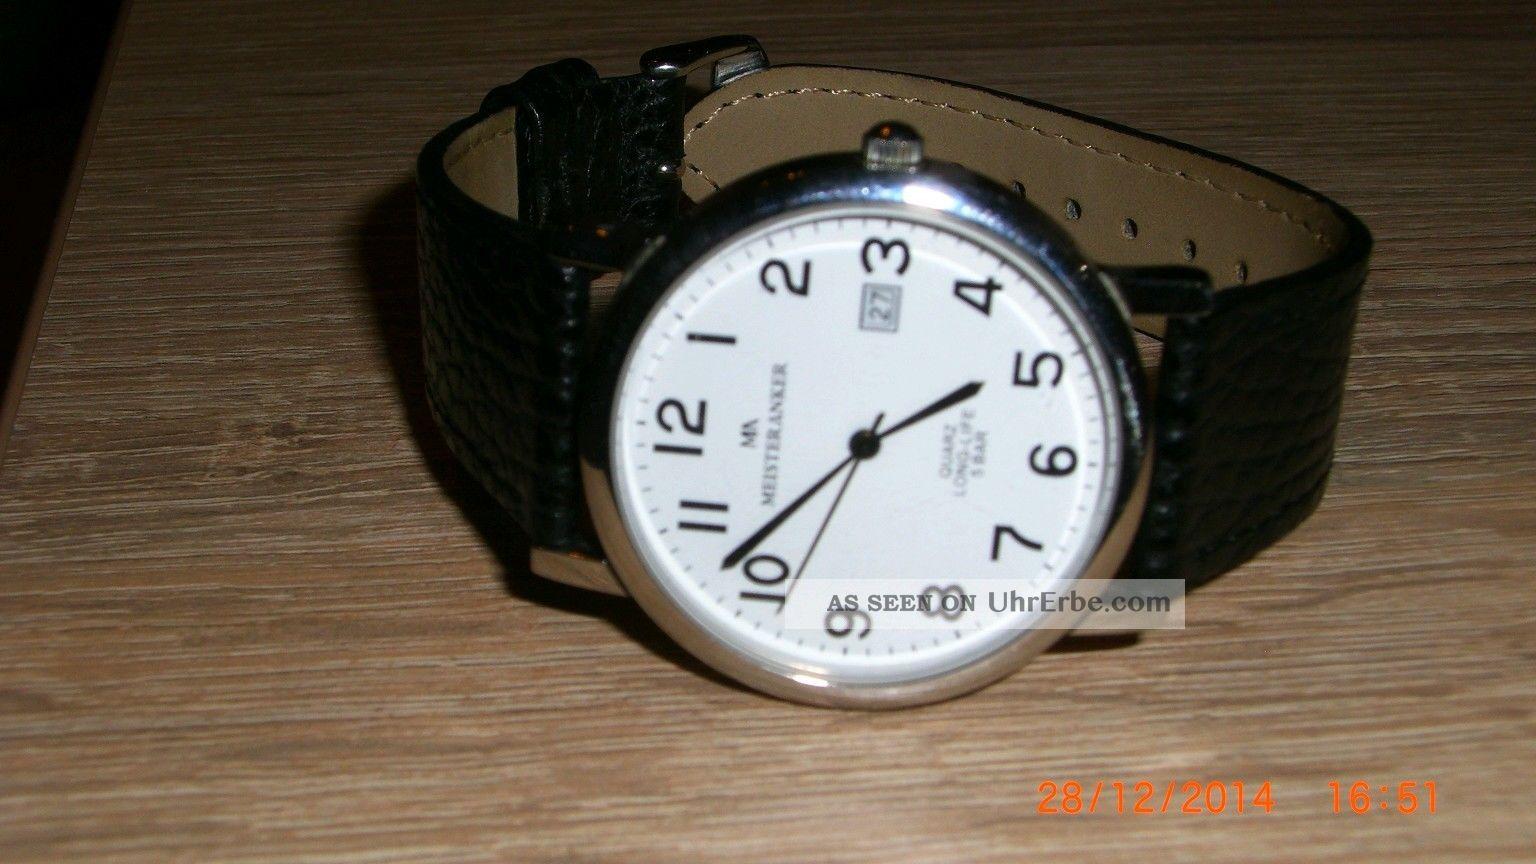 Meister - Anker Quartz Armbanduhr Lederarmband Armbanduhren Bild